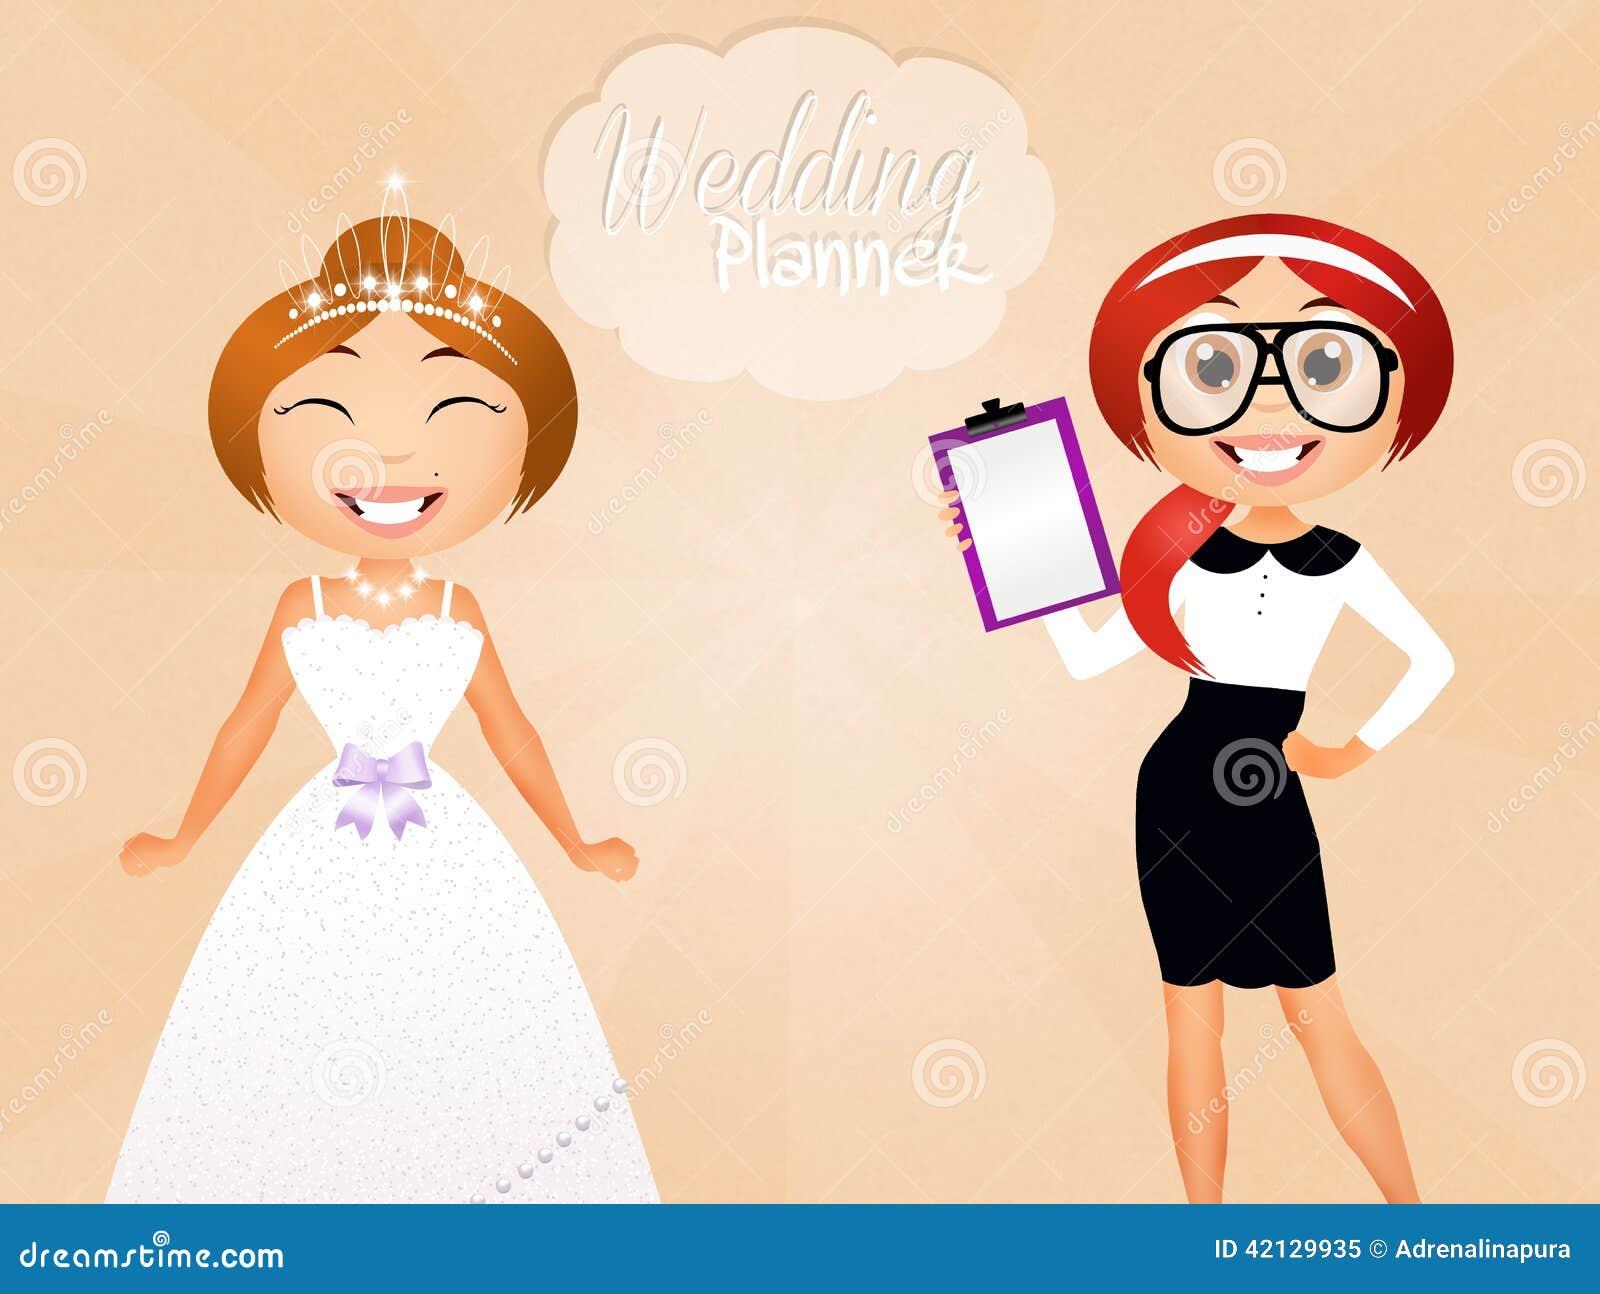 Wedding planner stock illustration Illustration of celebration